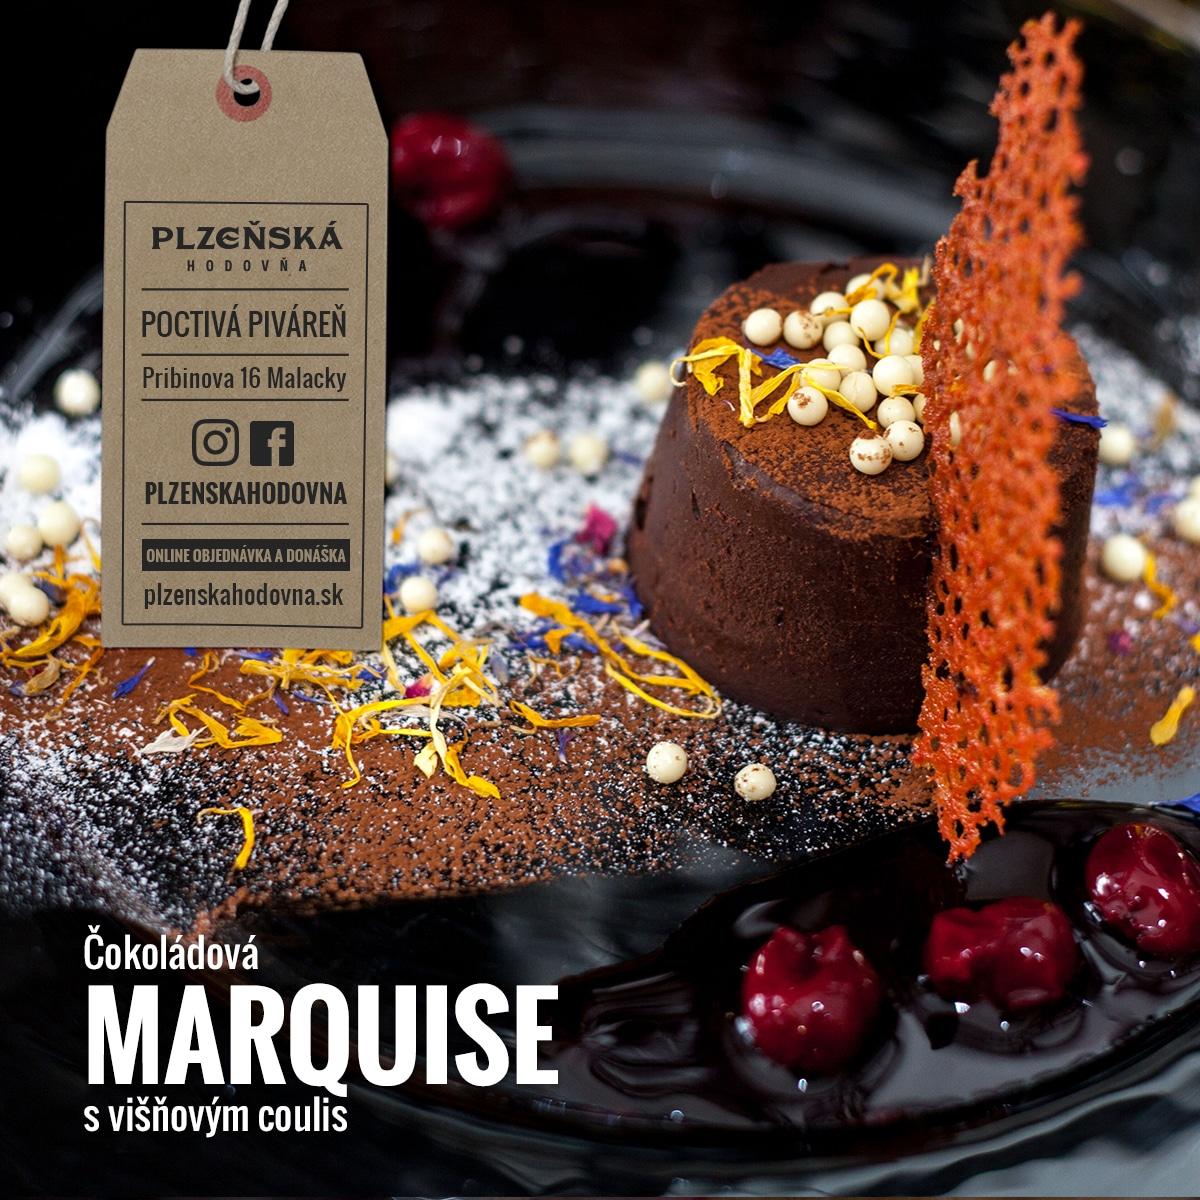 PH.marquise.1200